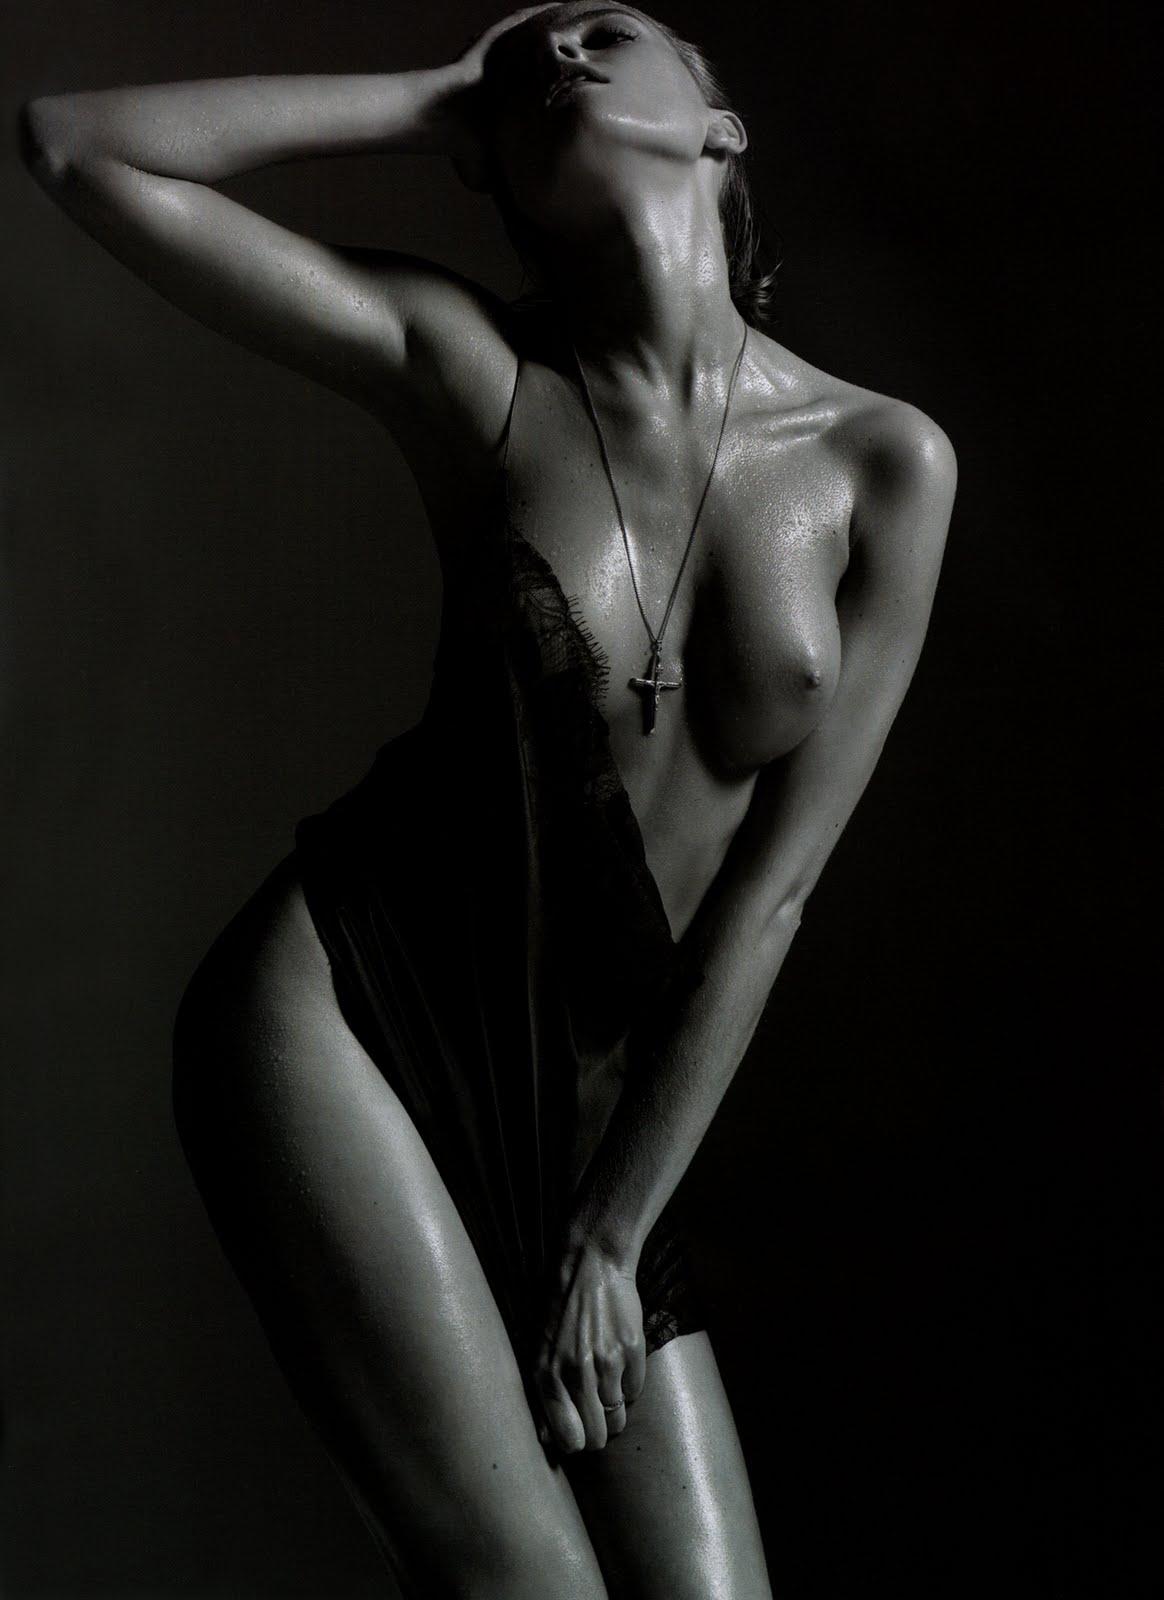 maryna linchuk nude